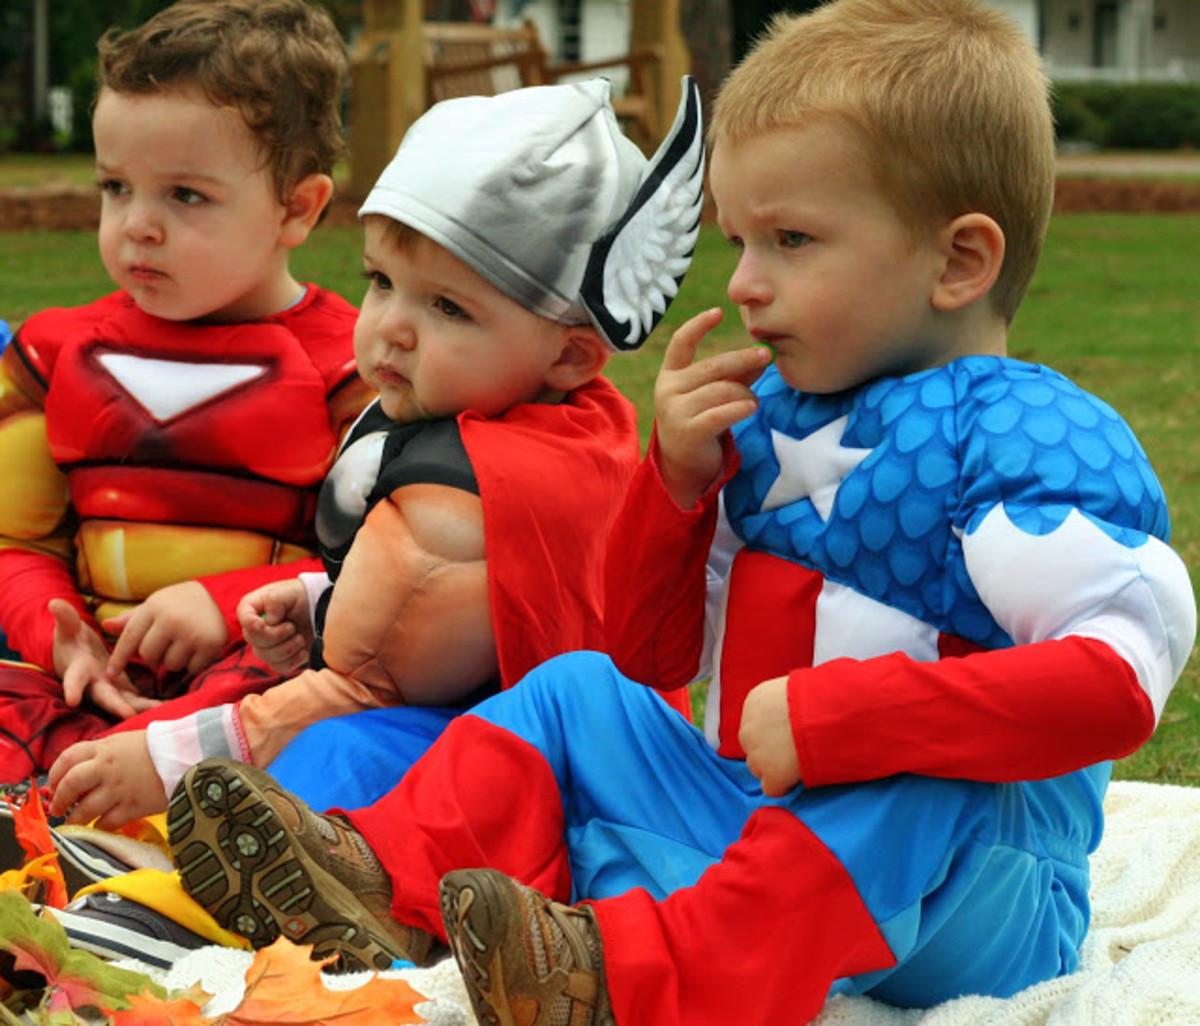 marvel-avengers-baby-costumes